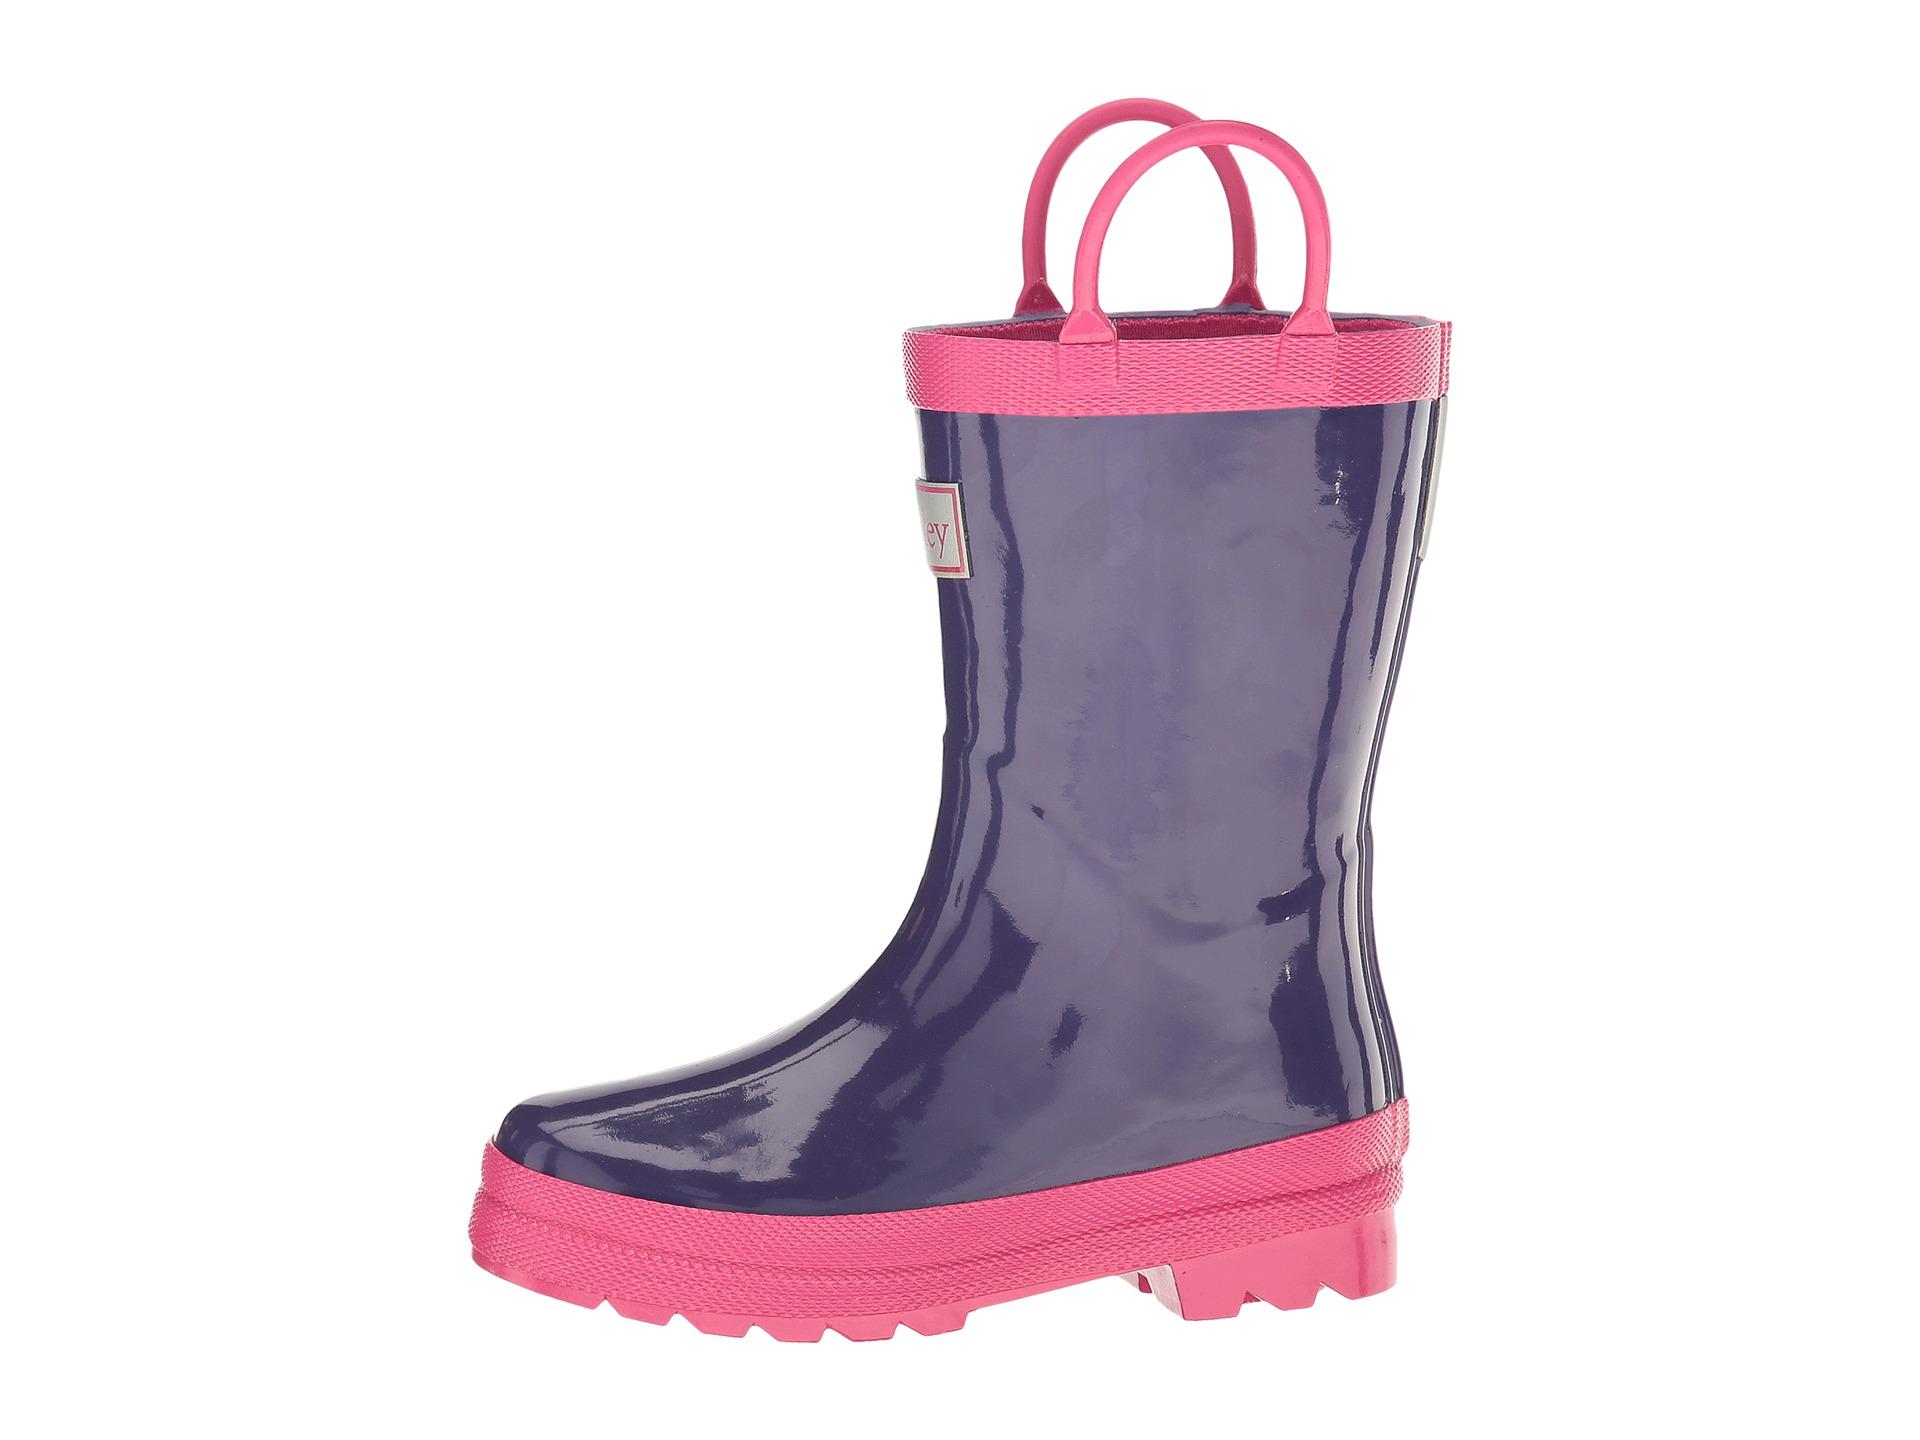 Hatley Kids Pink Purple Rain Boots Toddler Little